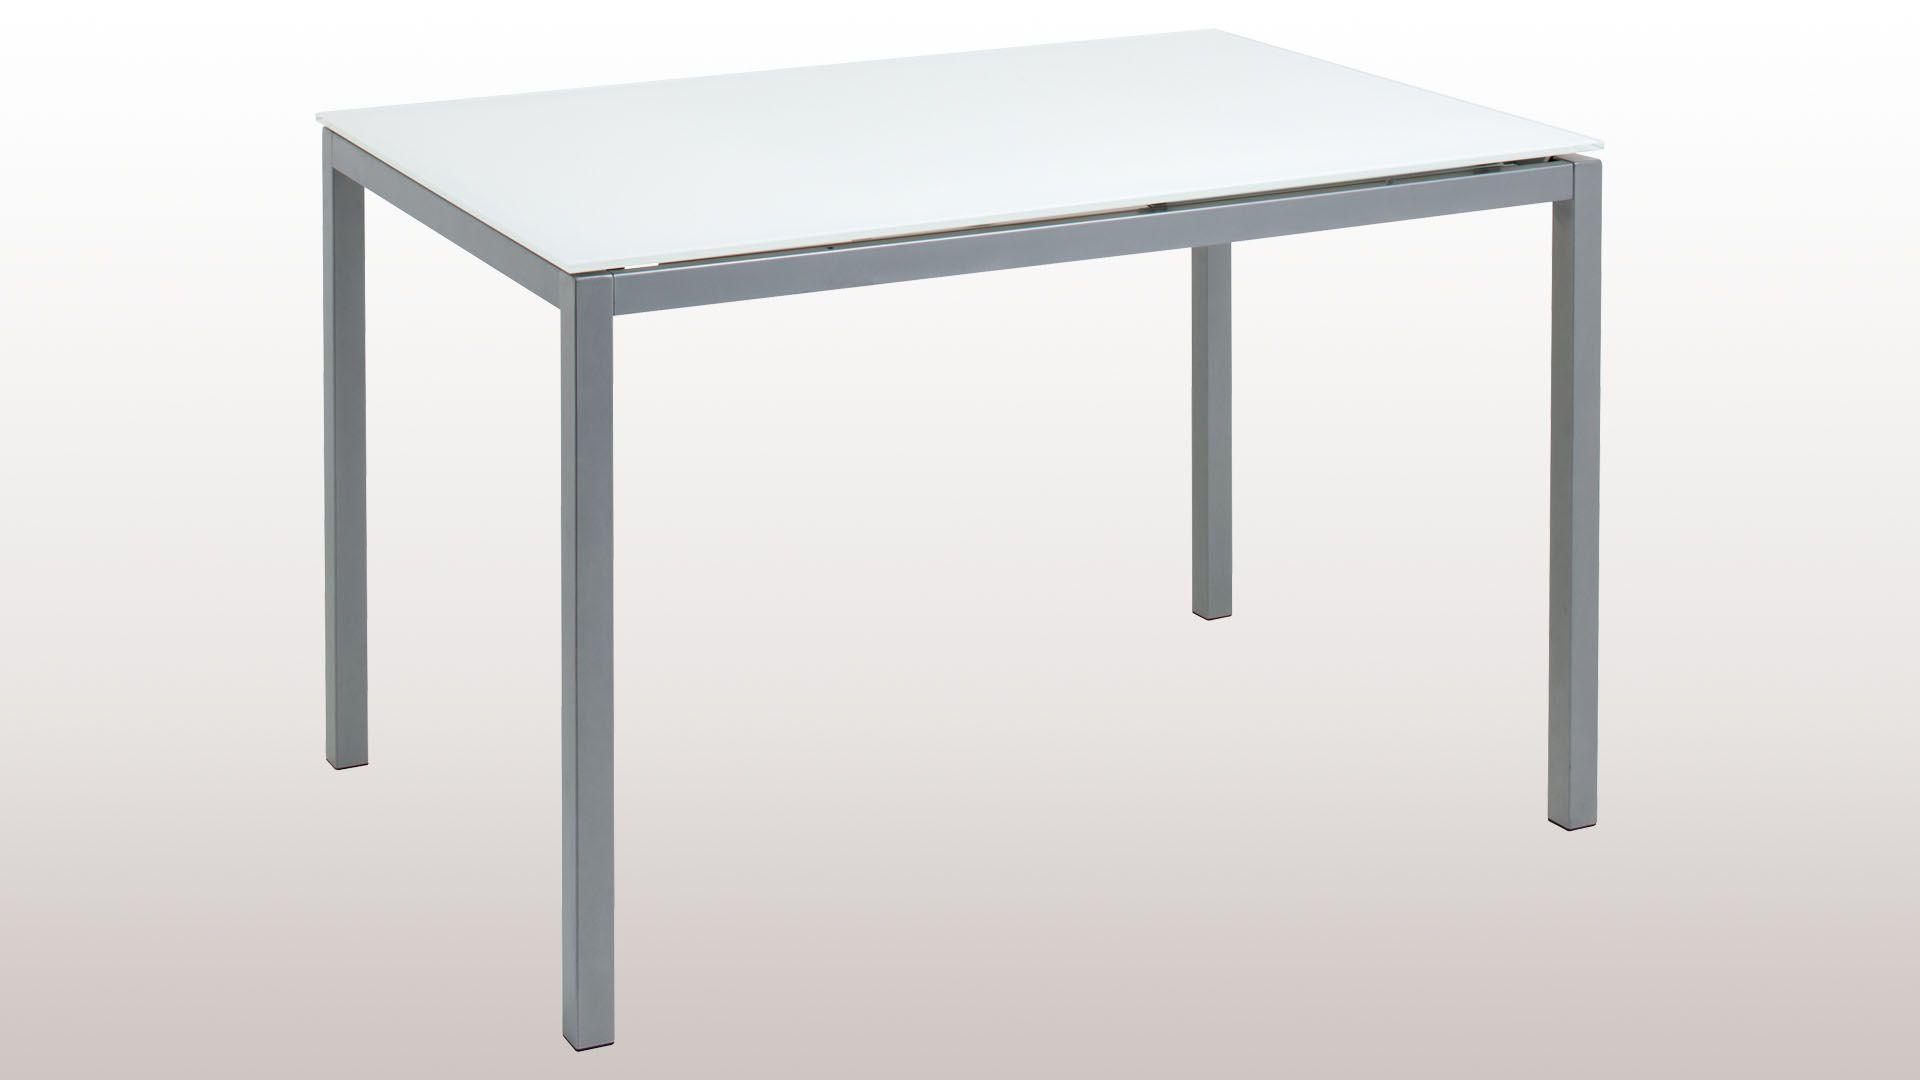 235e0d698ecf012b125e885c5f808942 Luxe De Table De Jardin Rallonge Conception